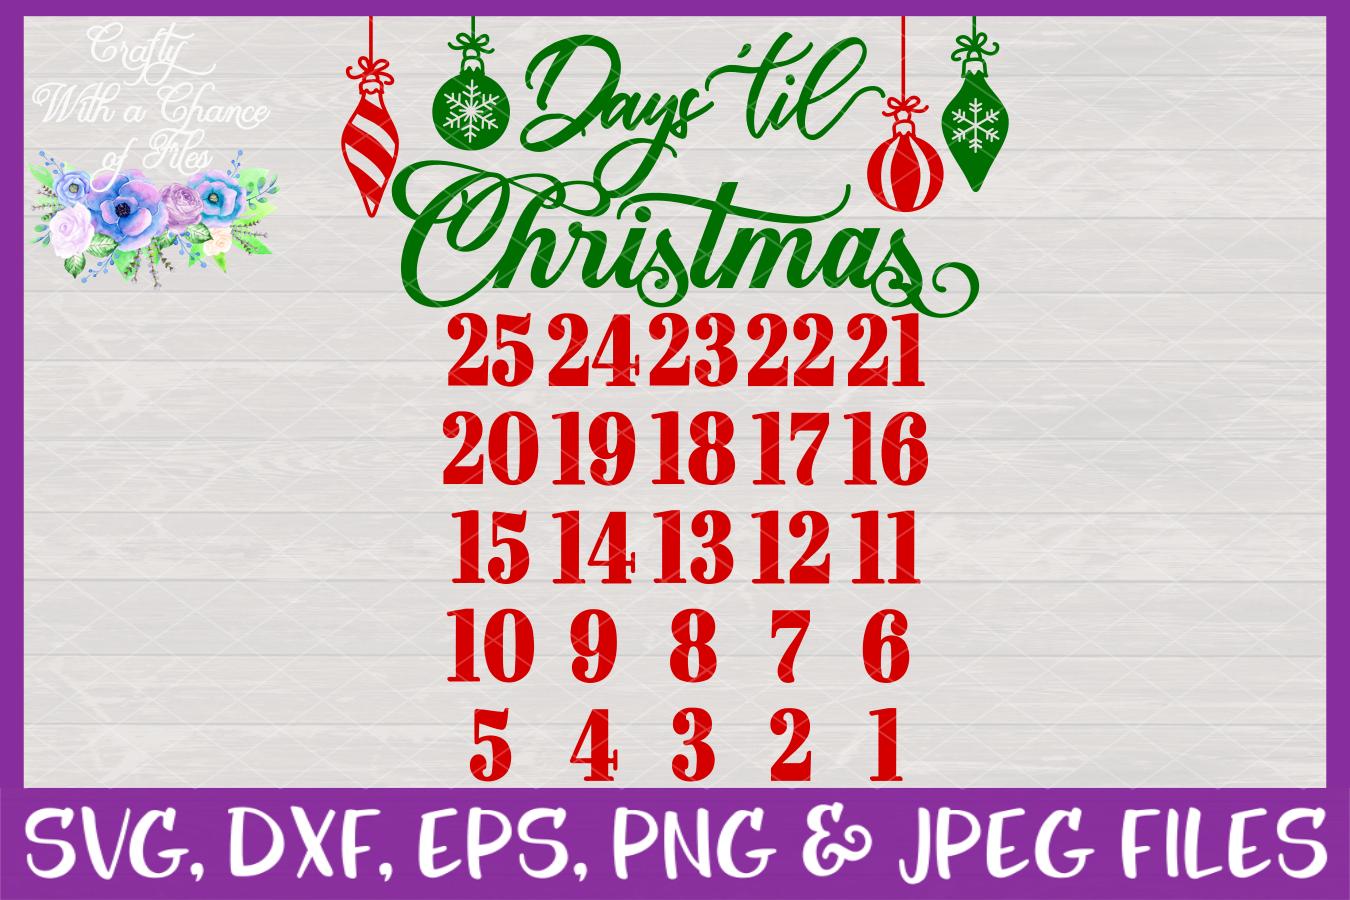 Days Until Christmas SVG - Advent Calendar Design example image 3